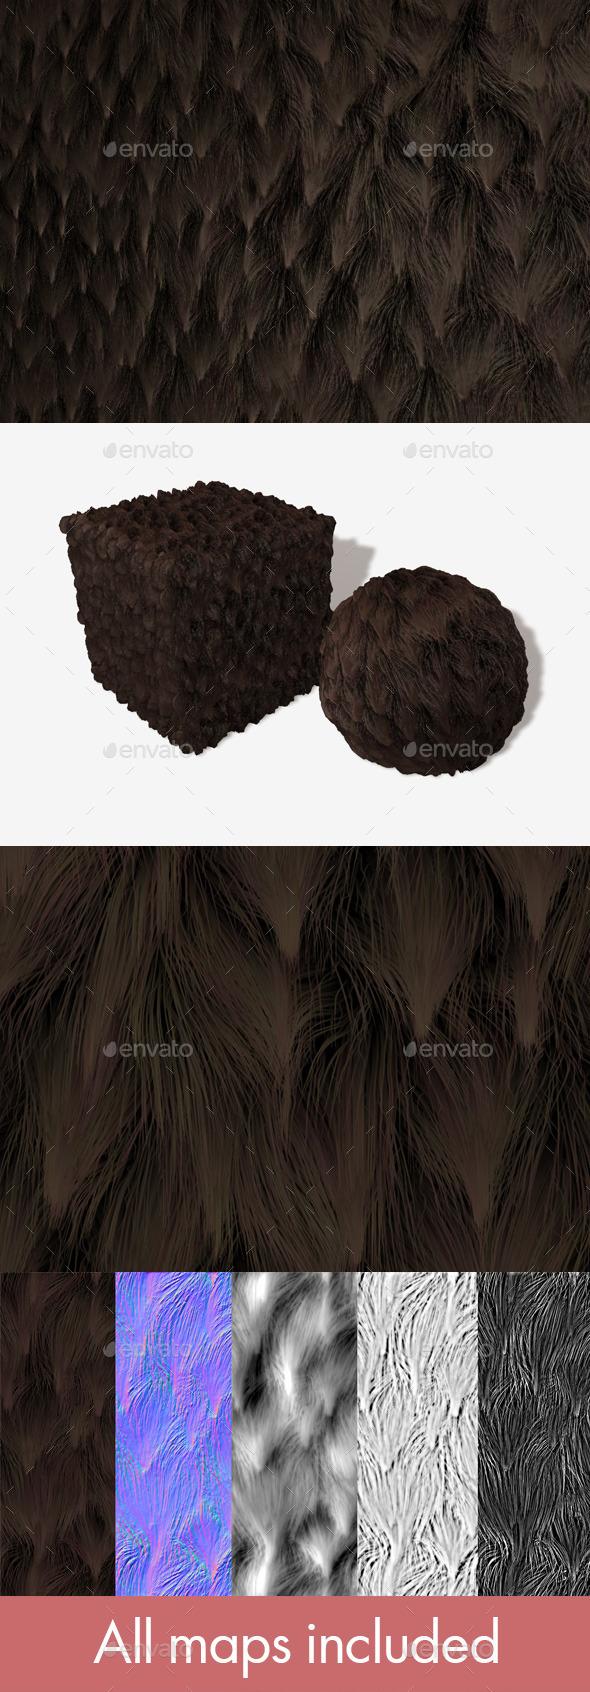 3DOcean Brown Clumpy Fur Seamless Texture 11081532